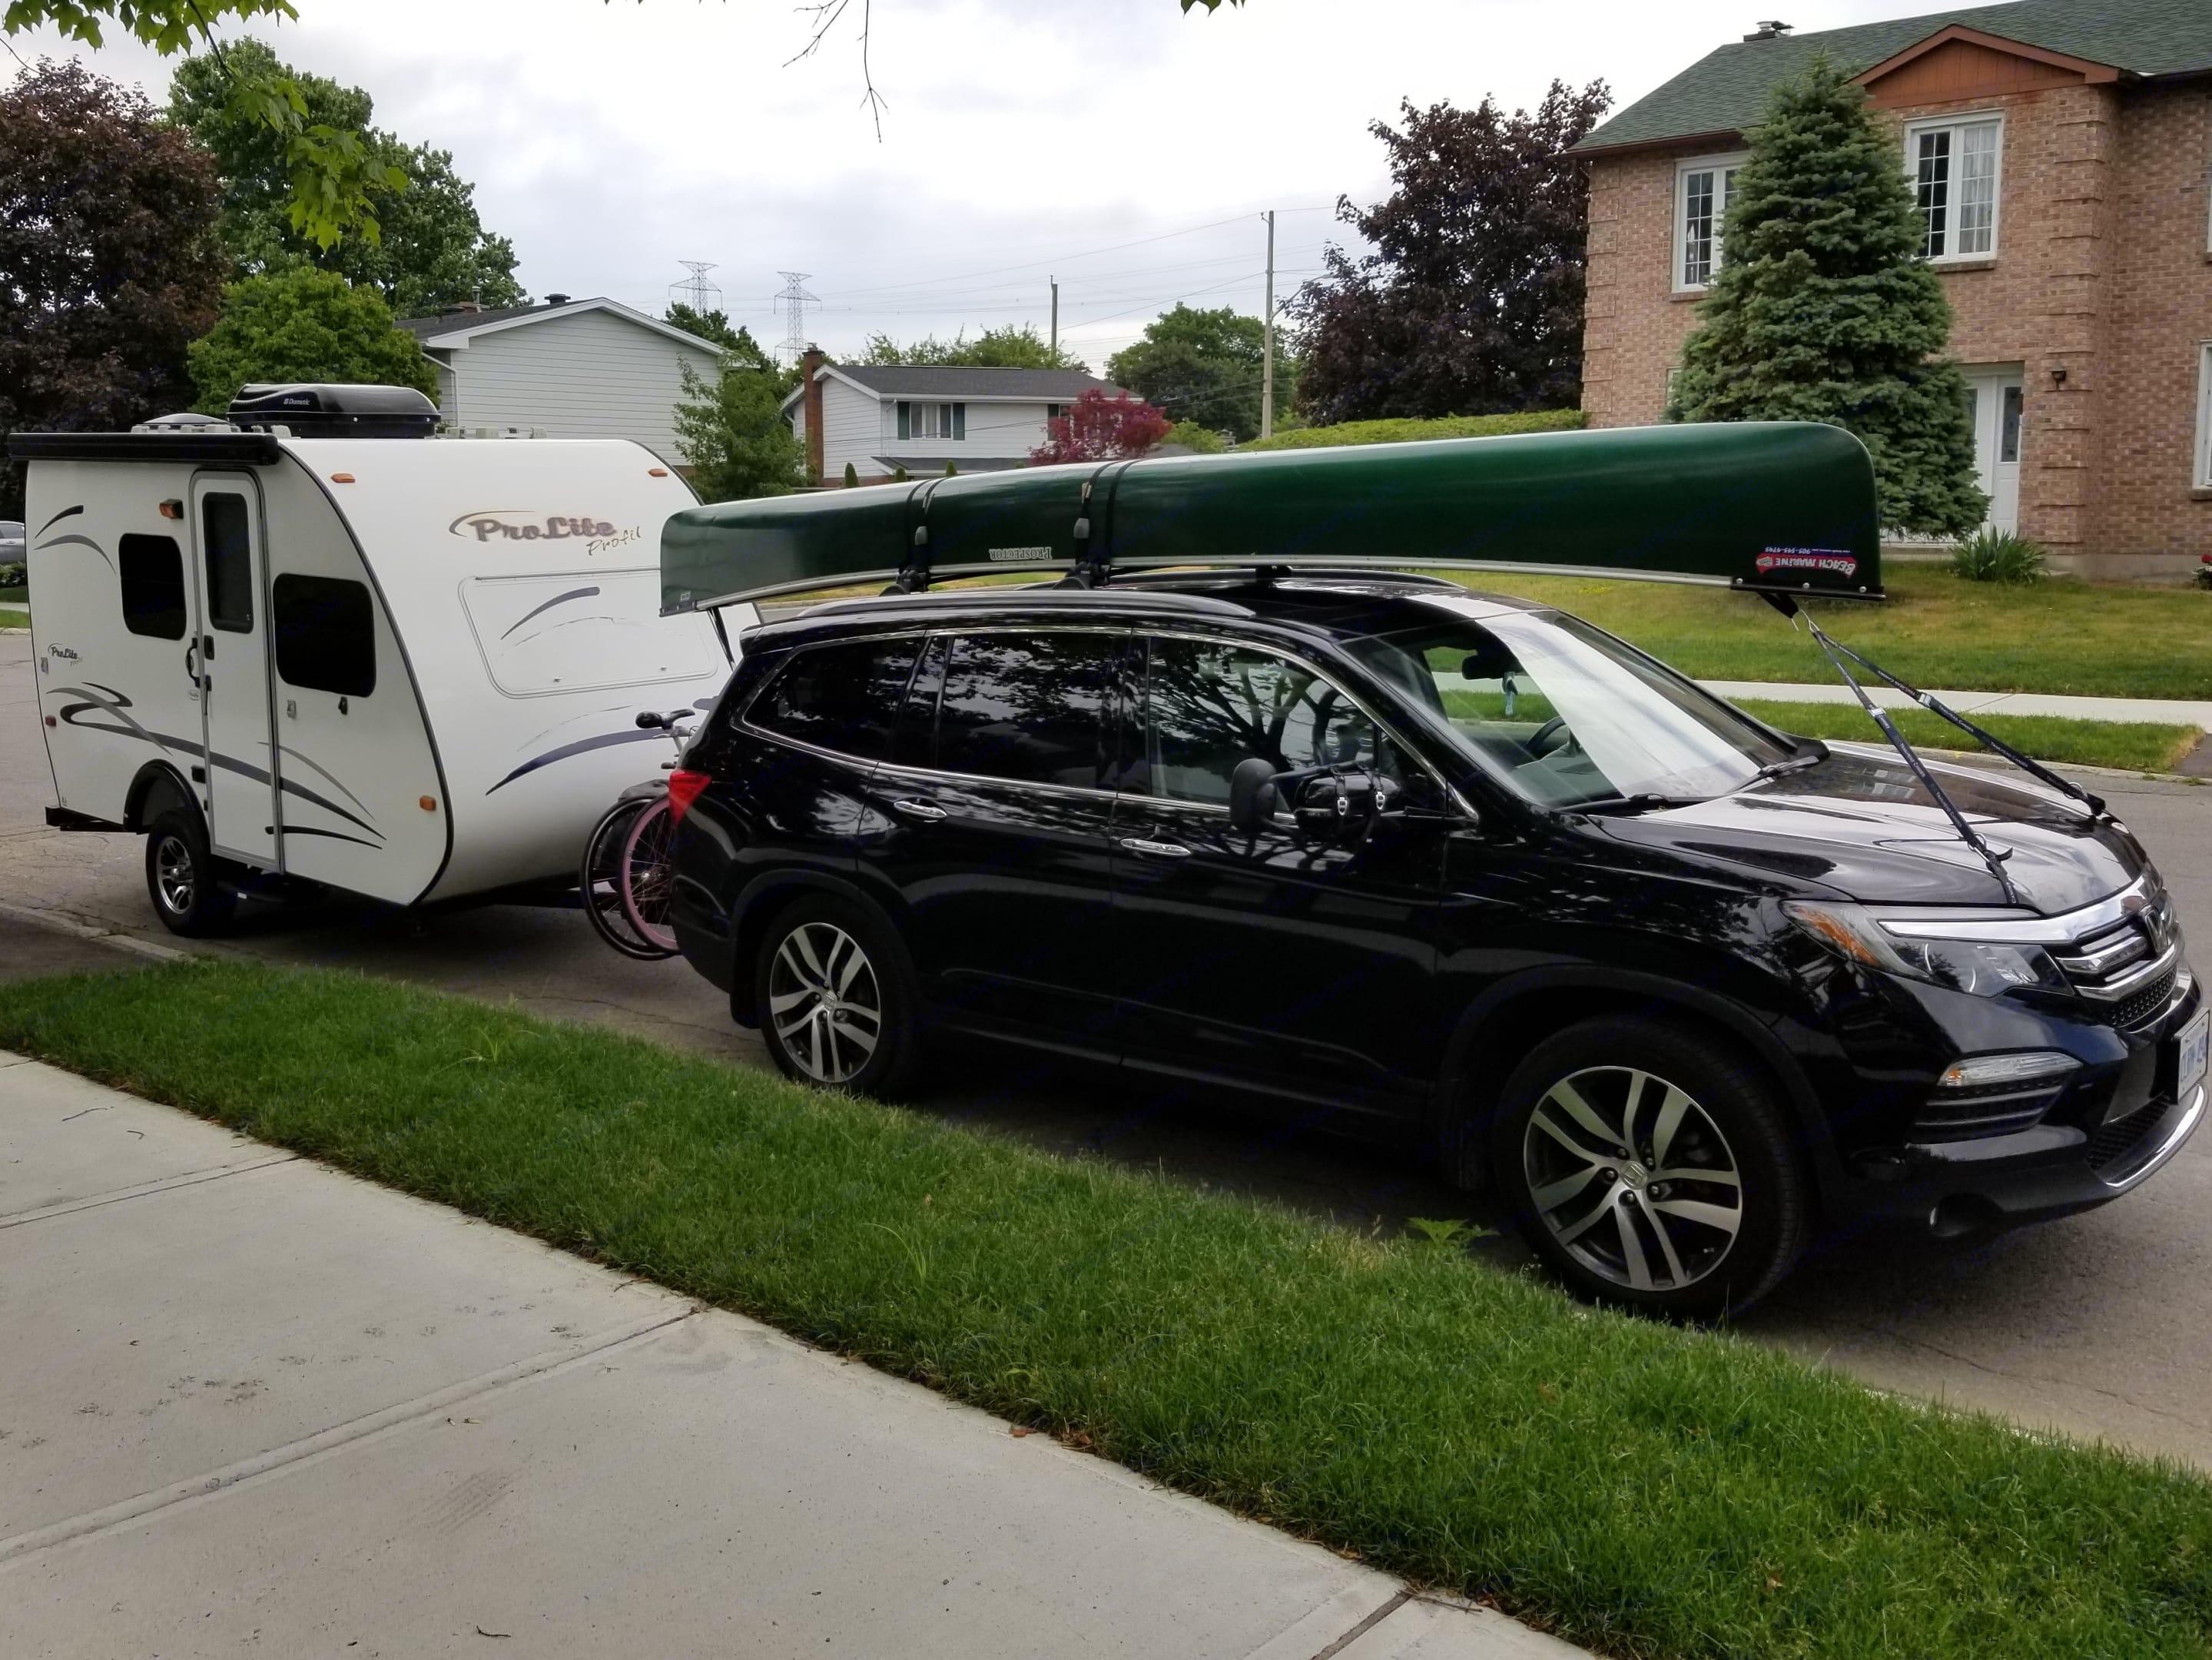 Towable with an SUV or Minivan. Prolight Rv Profil 14 2015